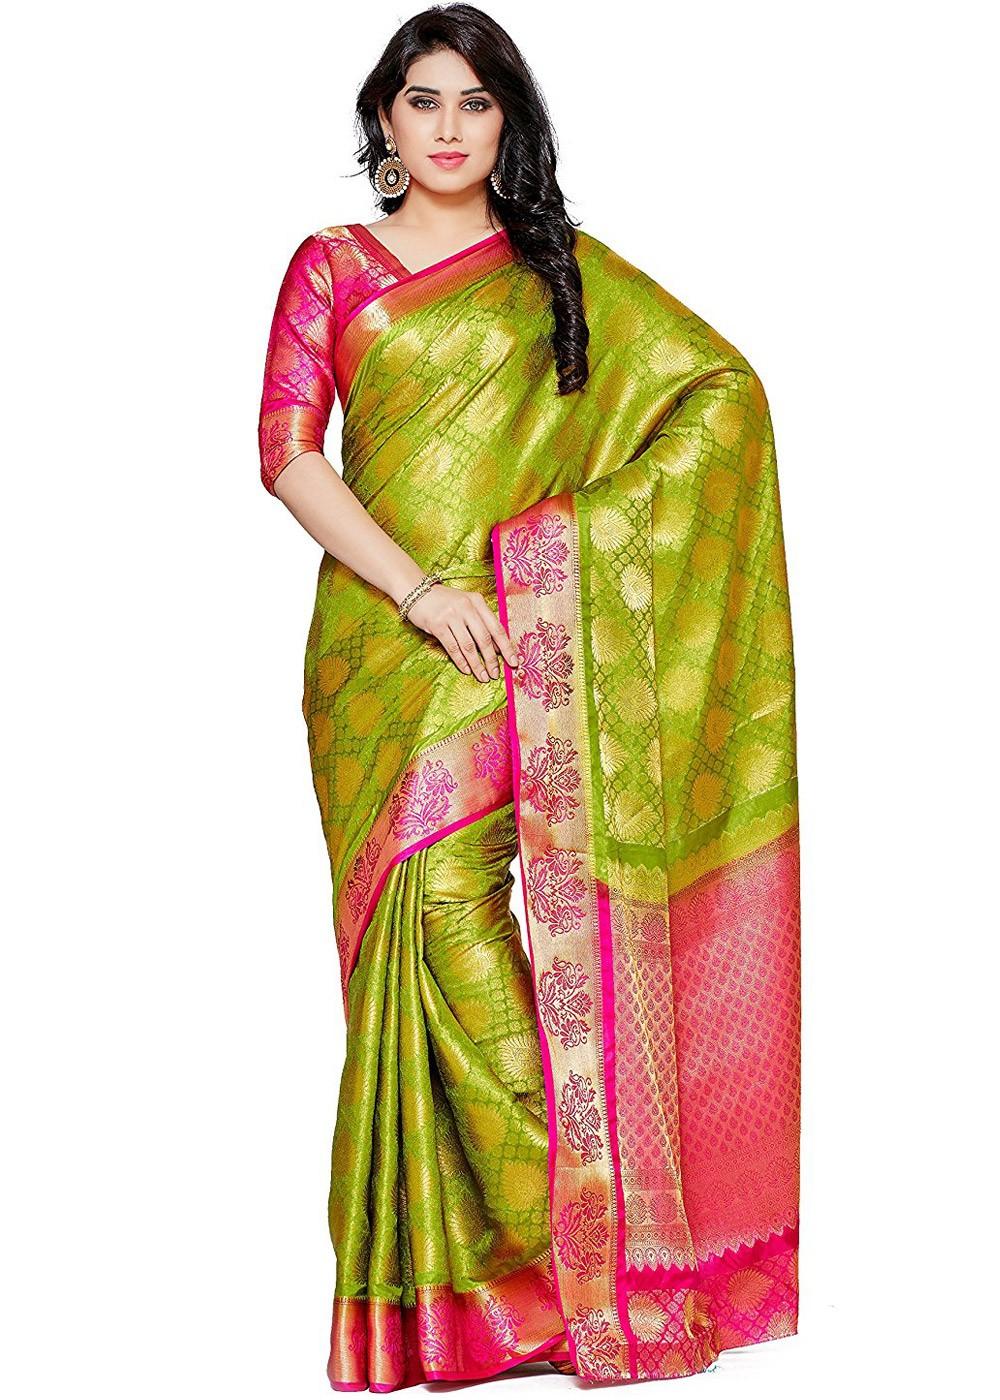 0692e5e818 Light Green Kanjivaram Silk Saree with Blouse. Tap to expand